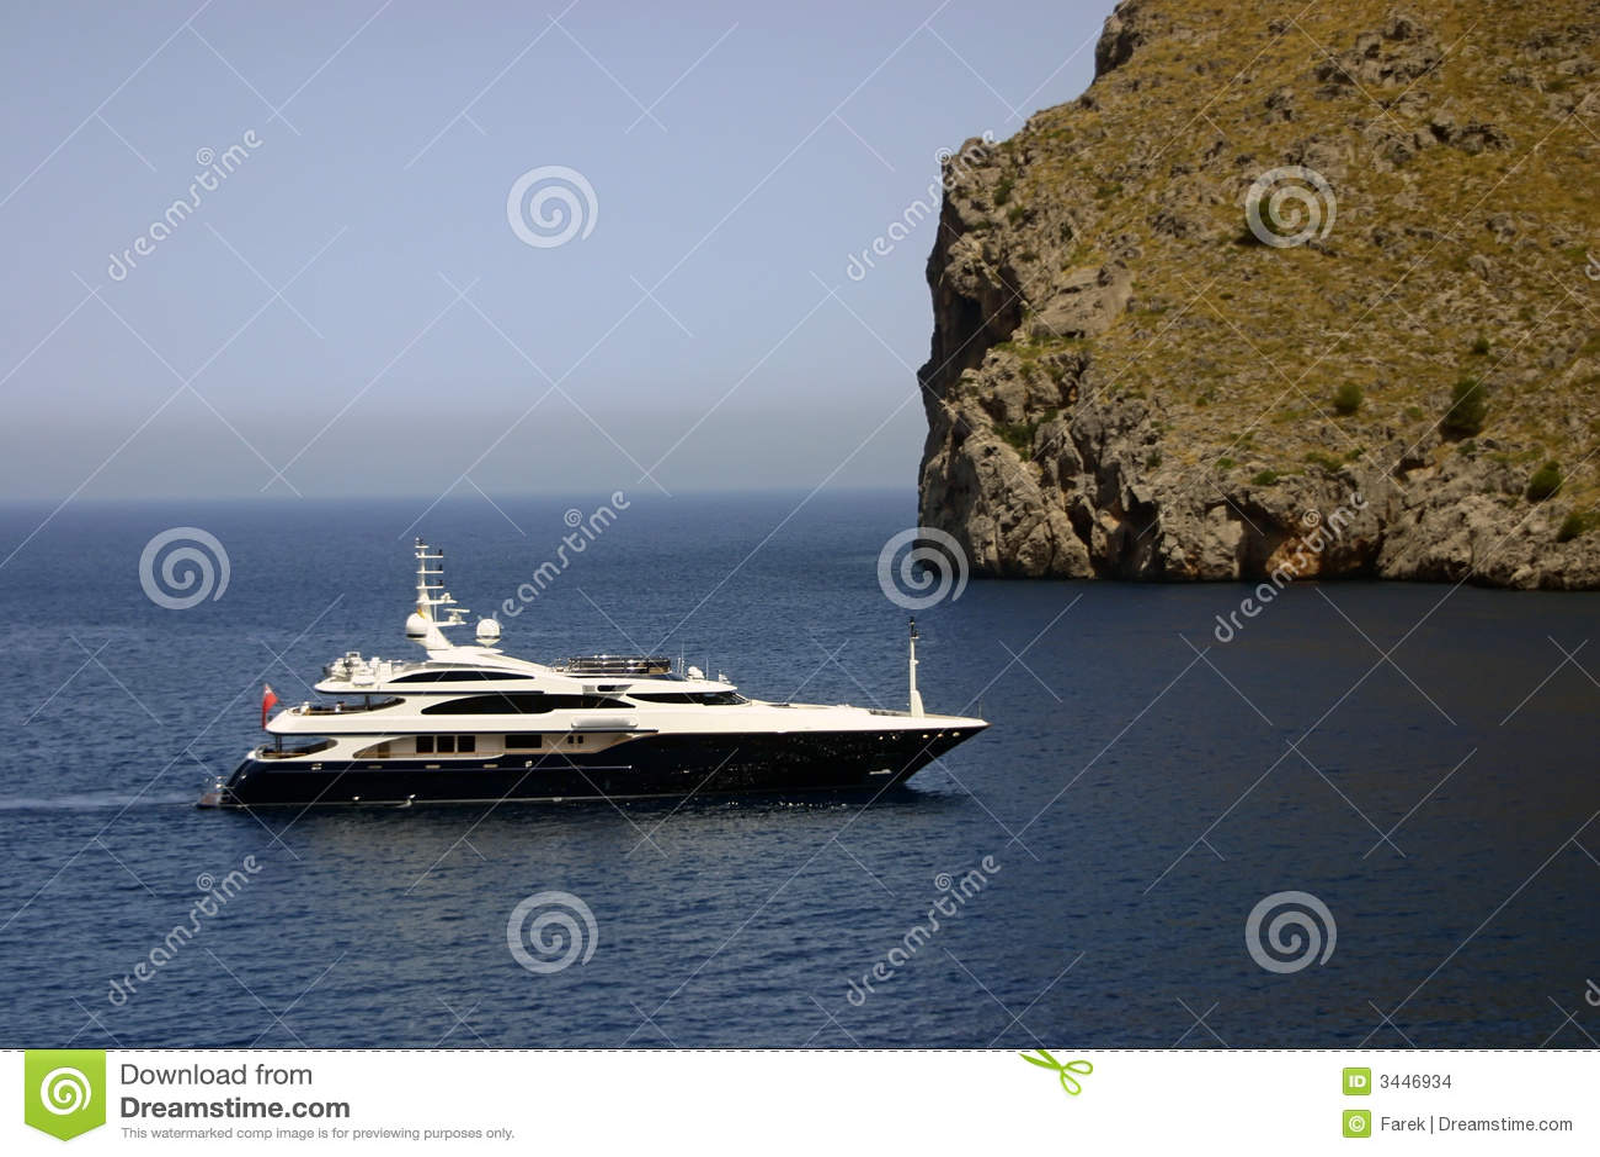 Luxury yacht trip